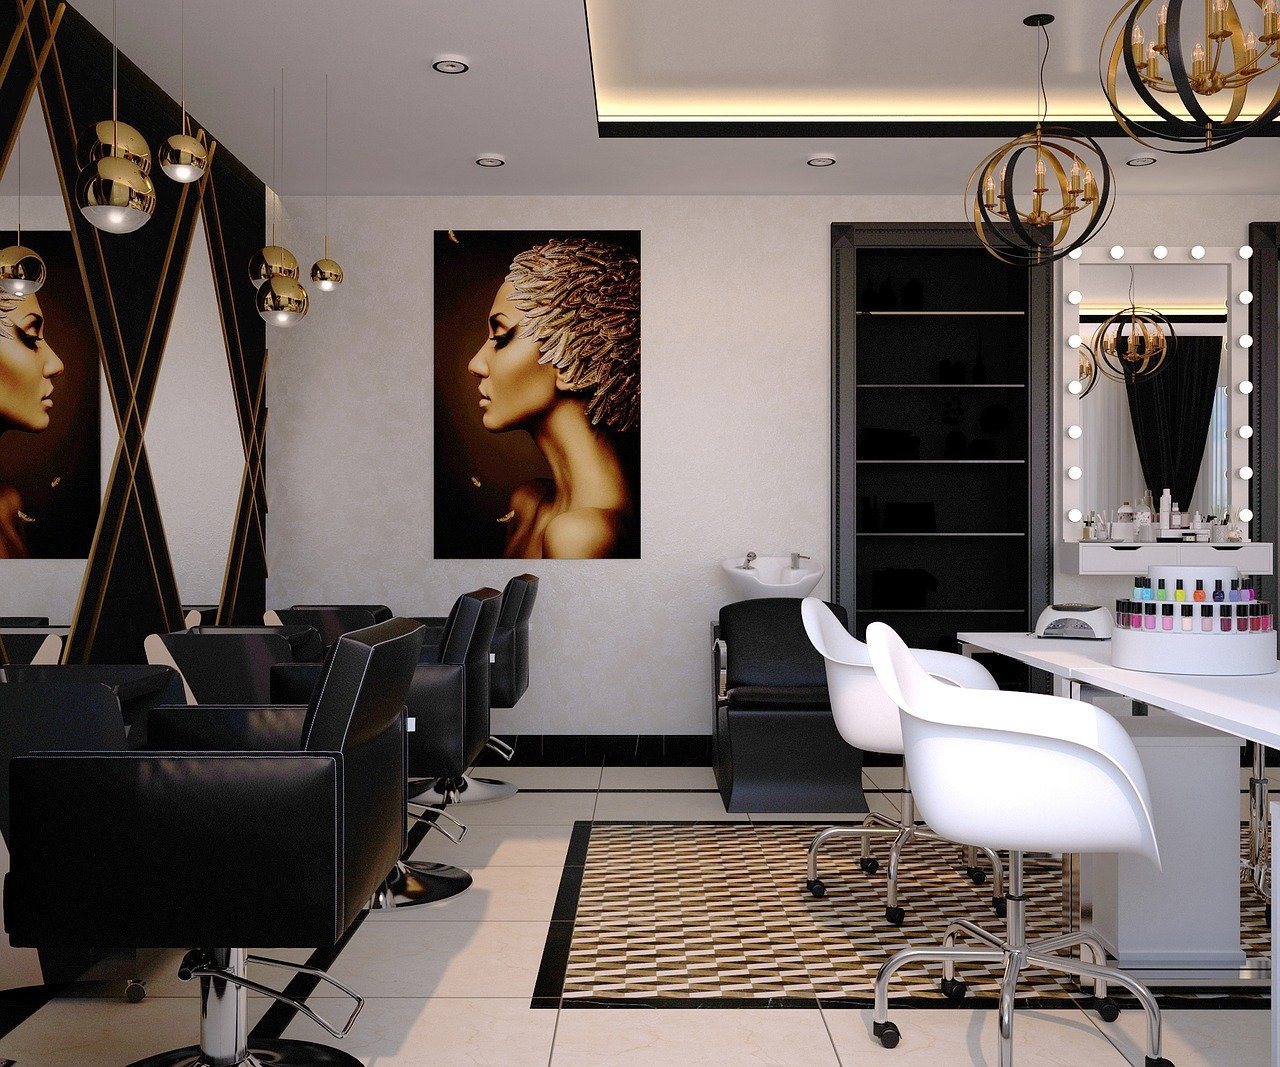 beauty-salon-4043096_1280